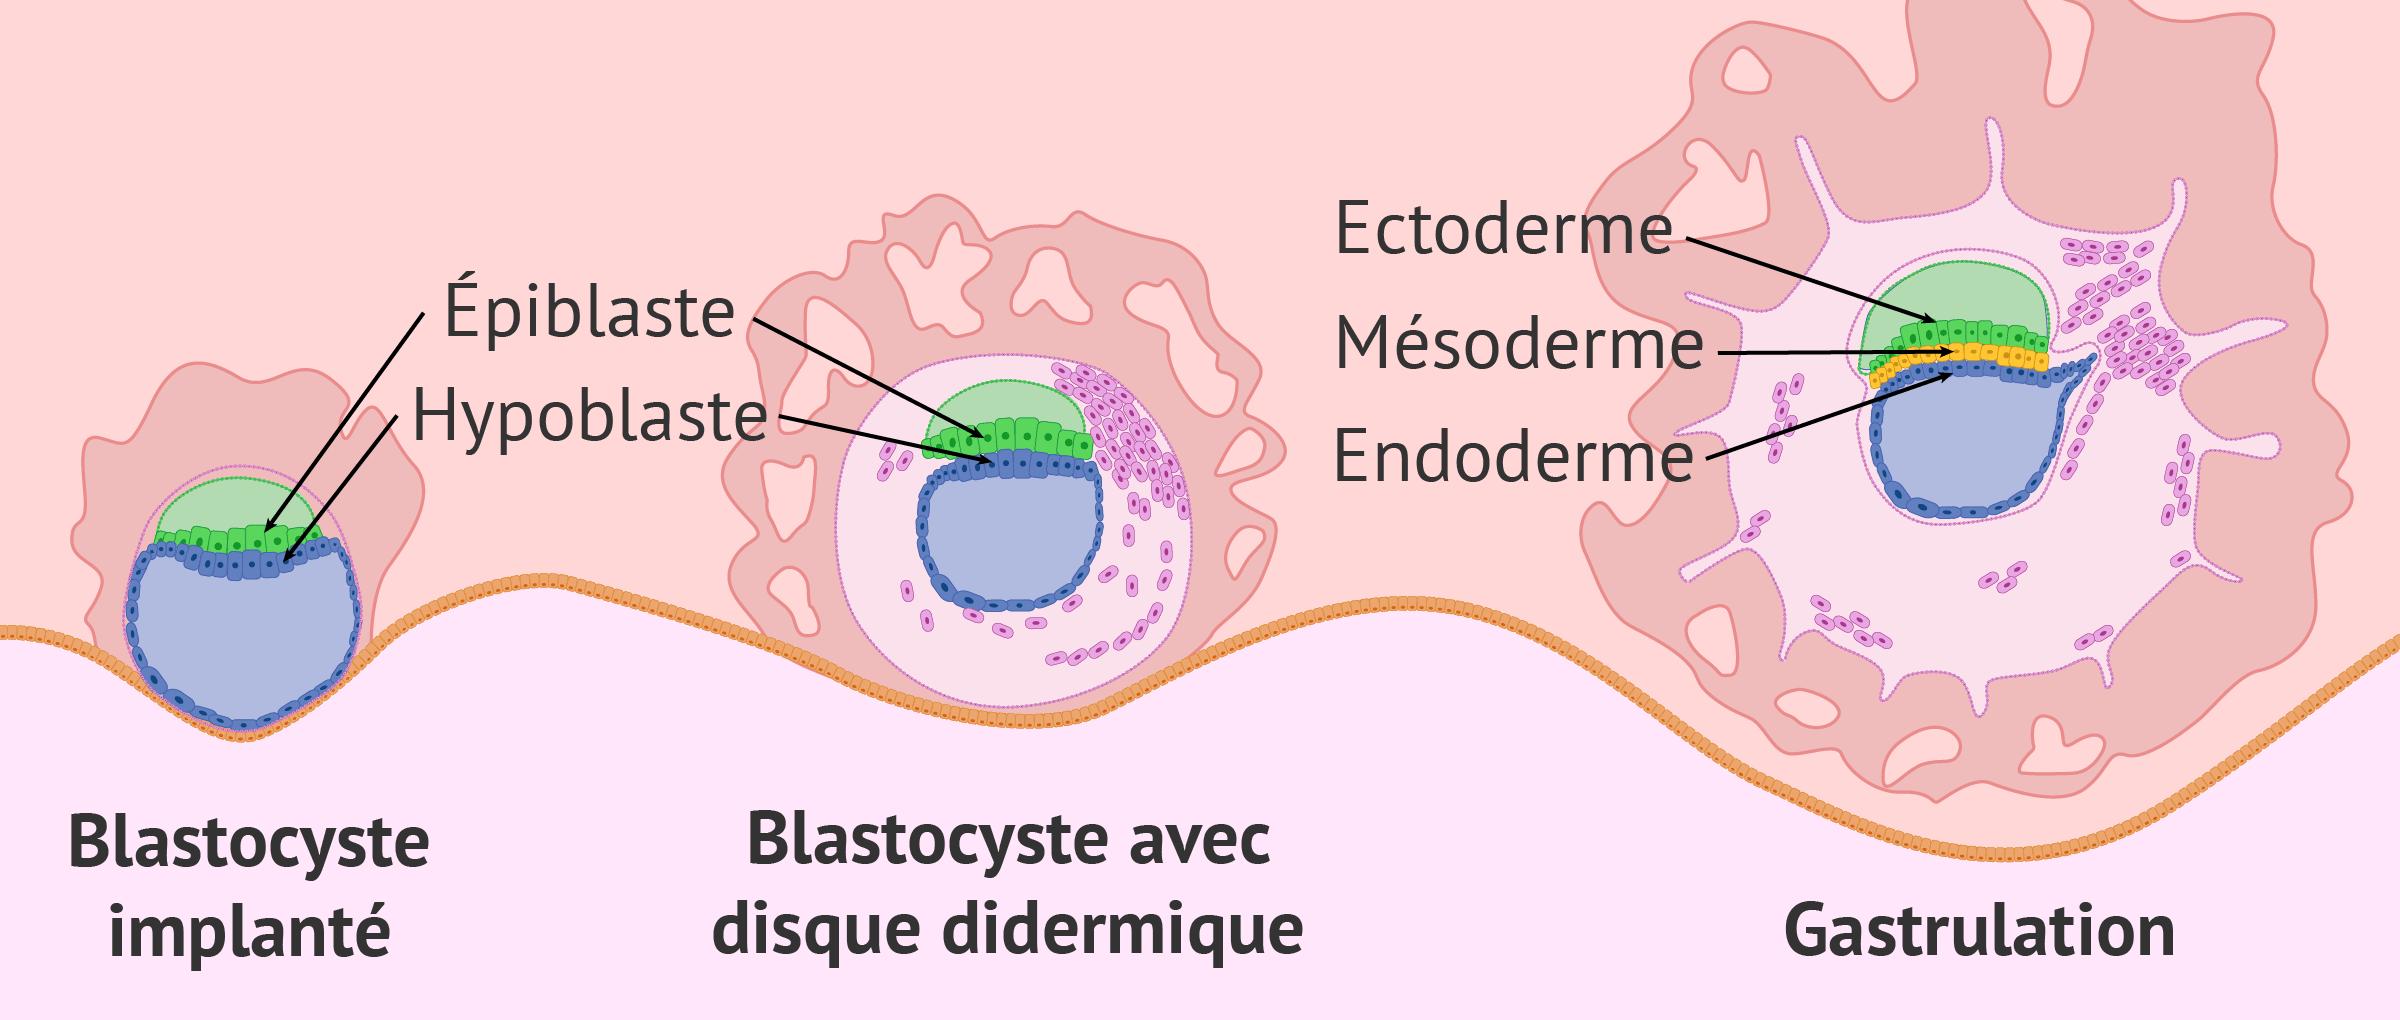 Implantation et gastrulation embryonnaire